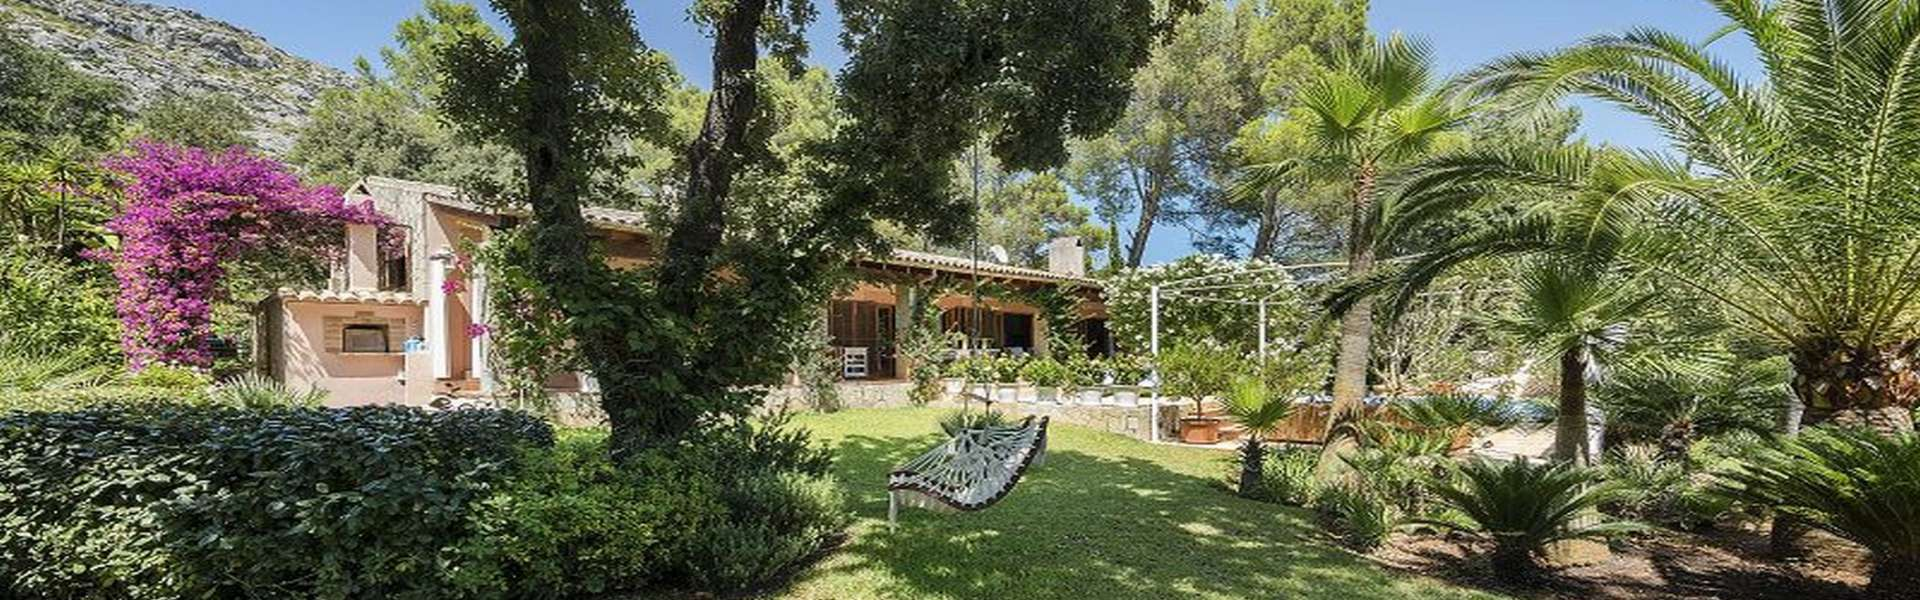 Pollensa - Charming villa in exclusive residential area